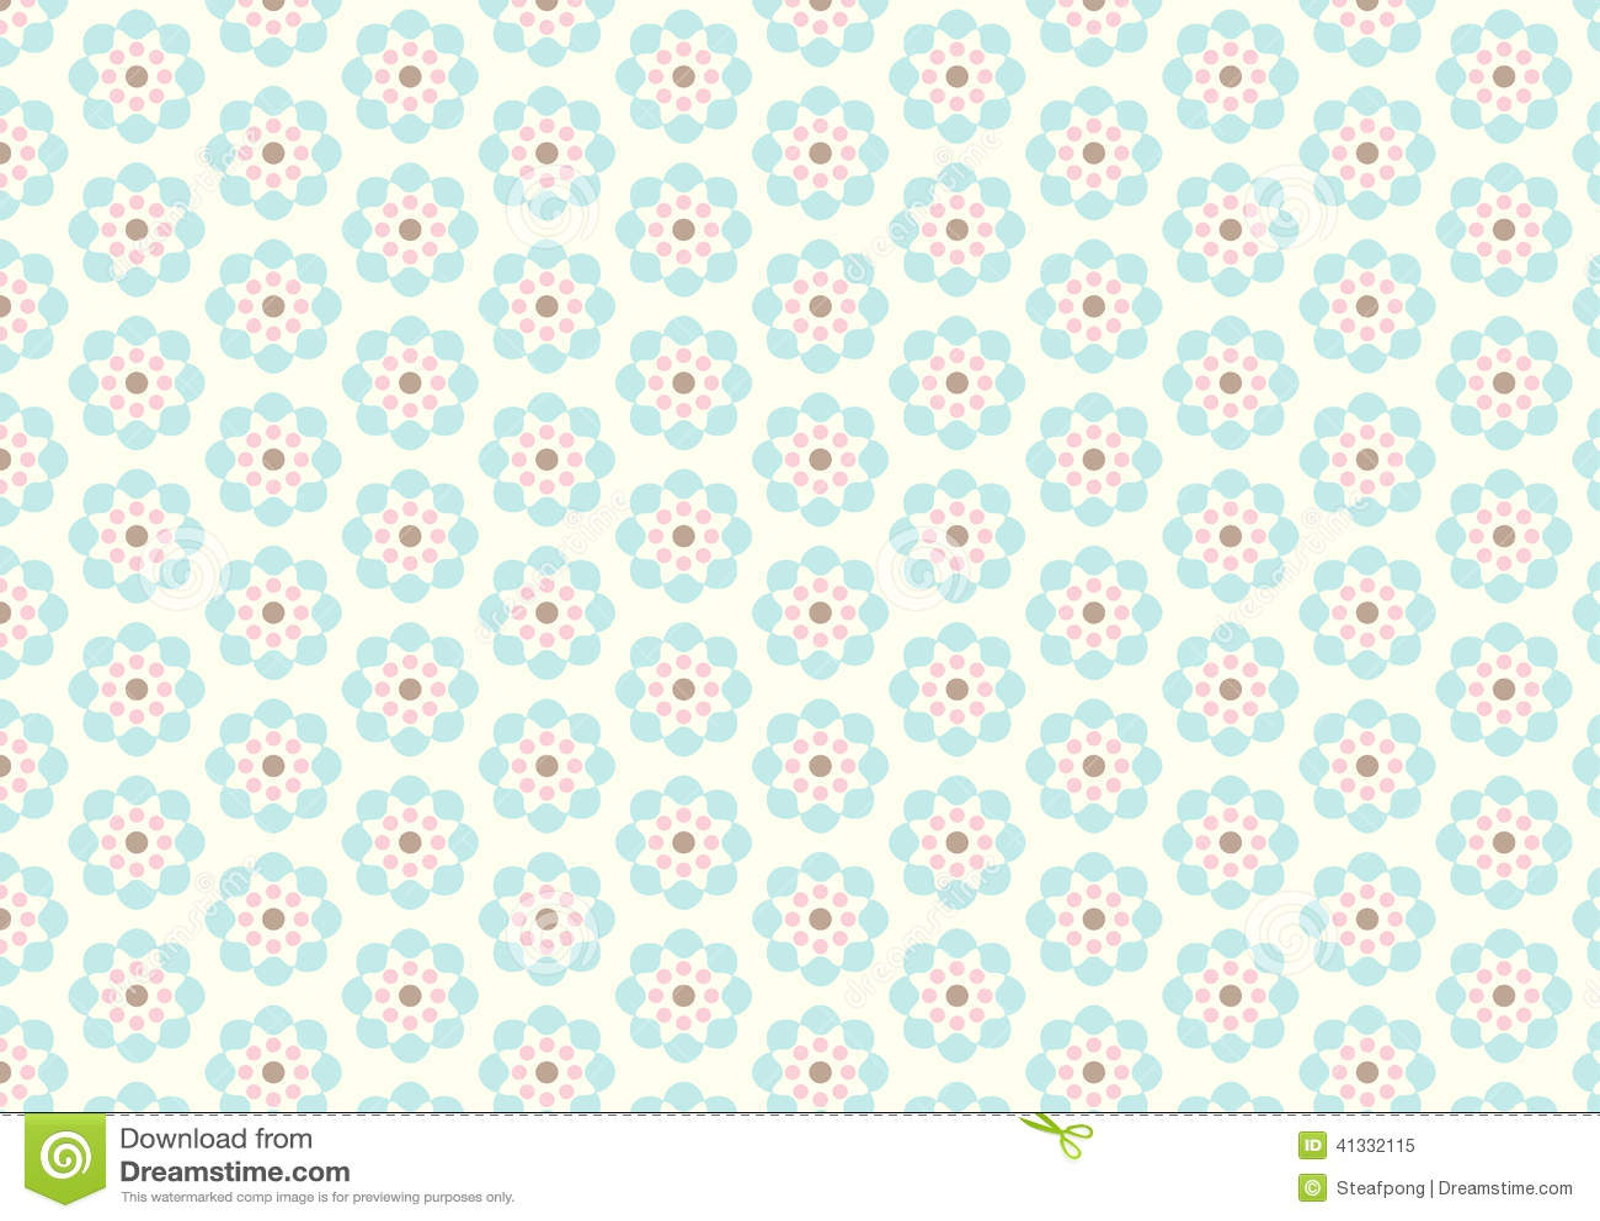 Vintage pastel pattern - photo#8